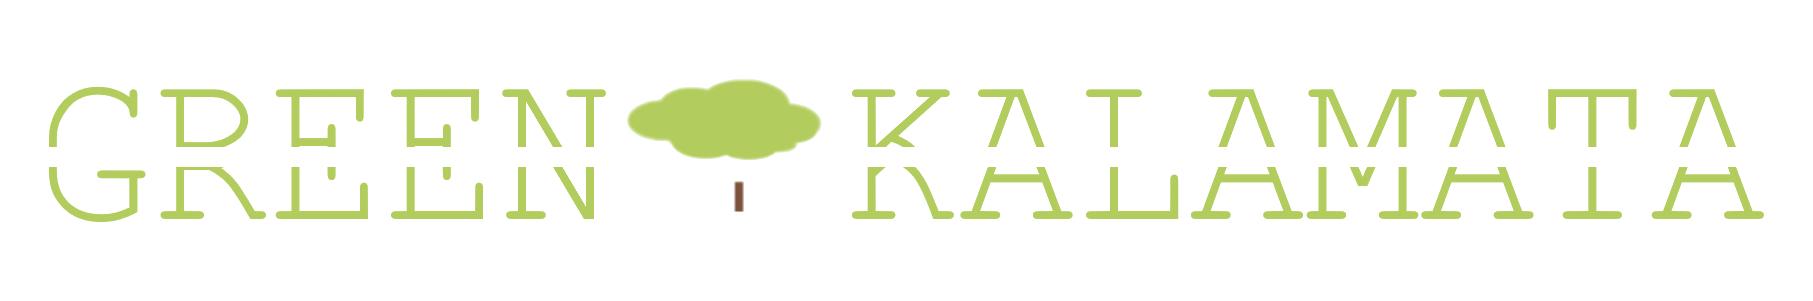 Green Kalamata